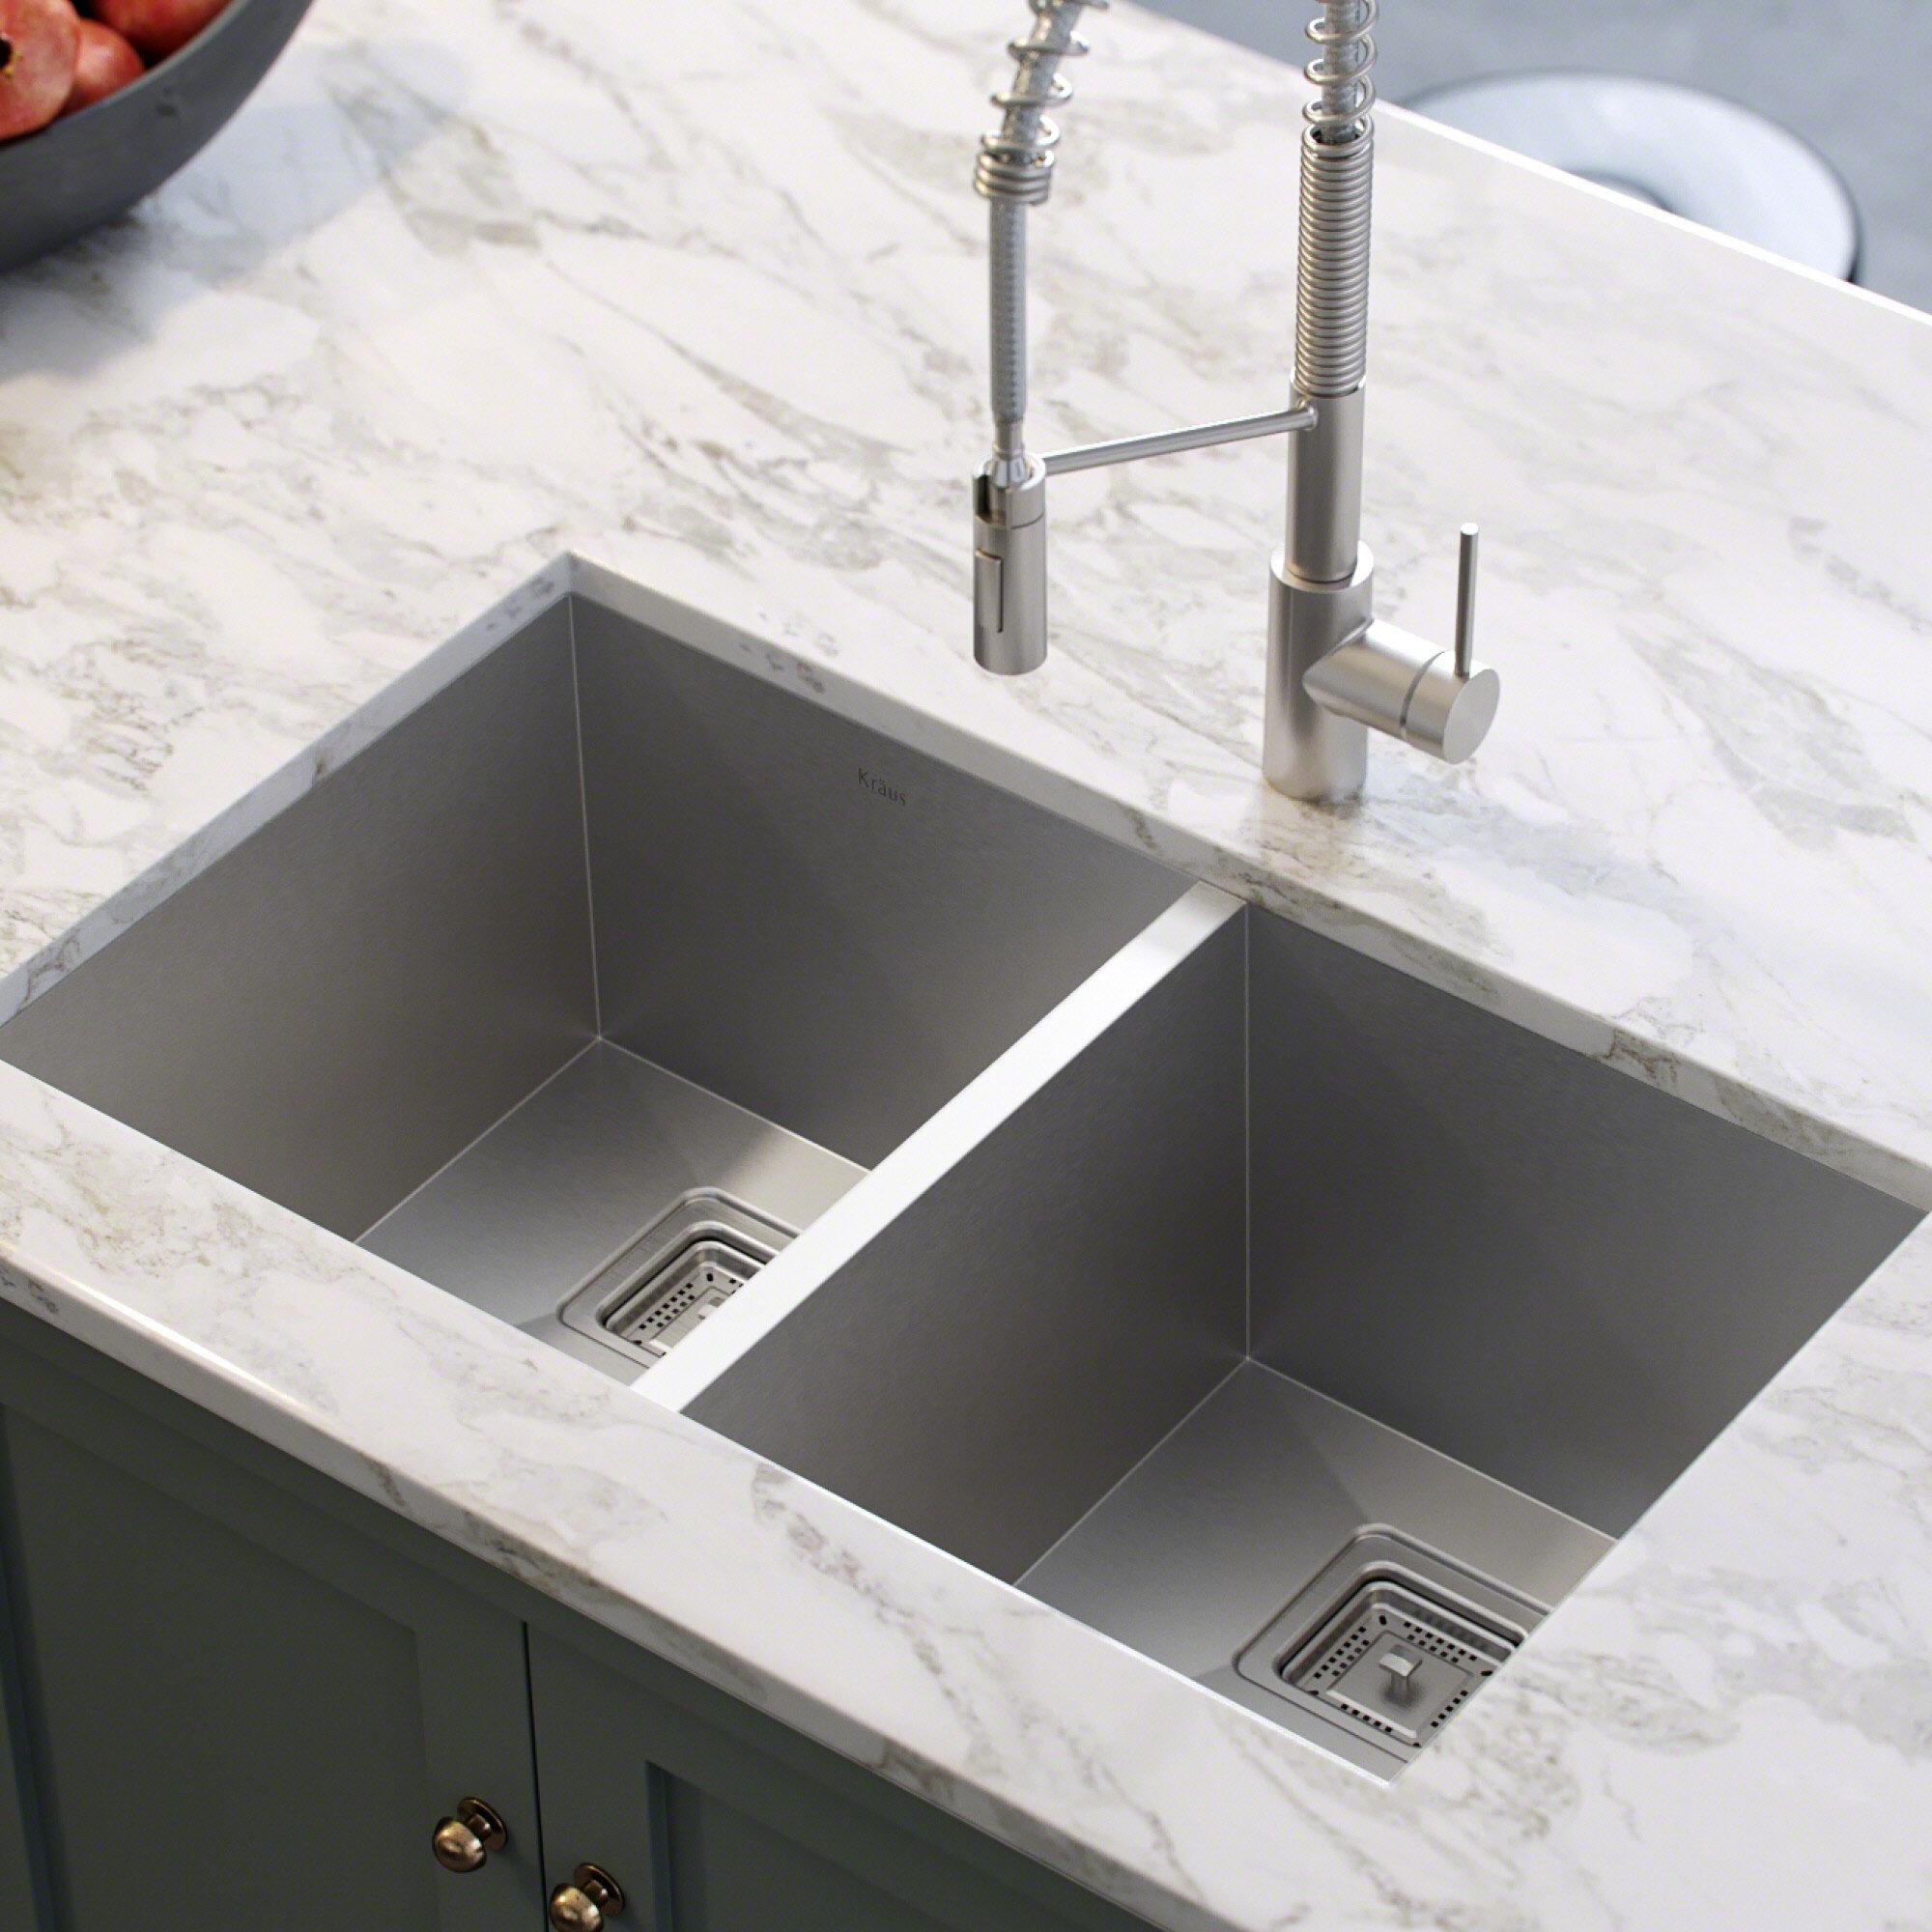 Khu322 Pax 31 5 X 18 Double Basin Undermount Kitchen Sink